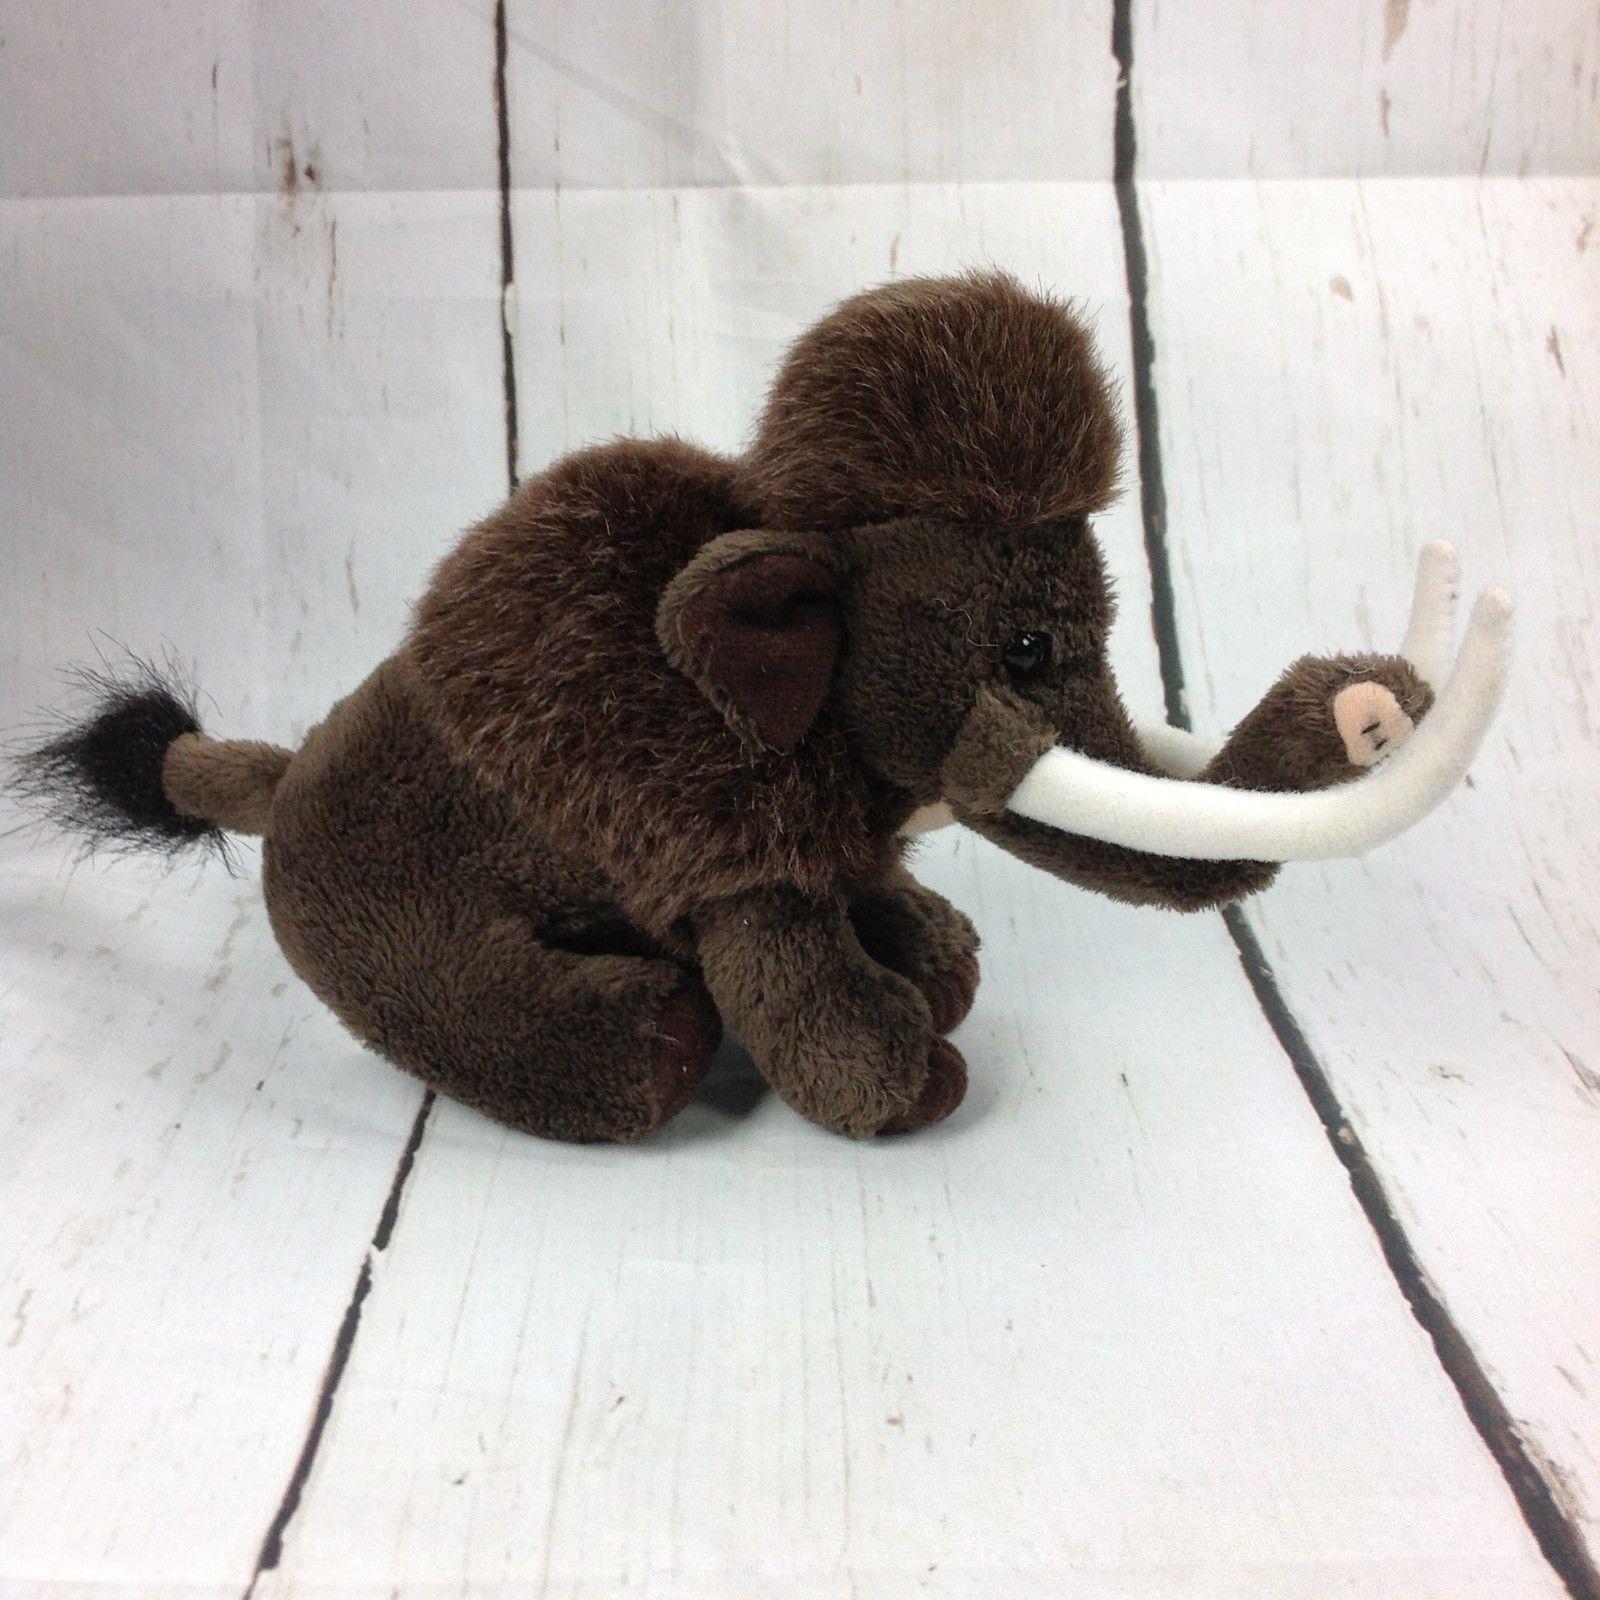 88a75942b3e S l1600. S l1600. Previous. Wild Republic Lil  Cuddlekins Brown Woolly  Mammoth Plush Prehistoric Small